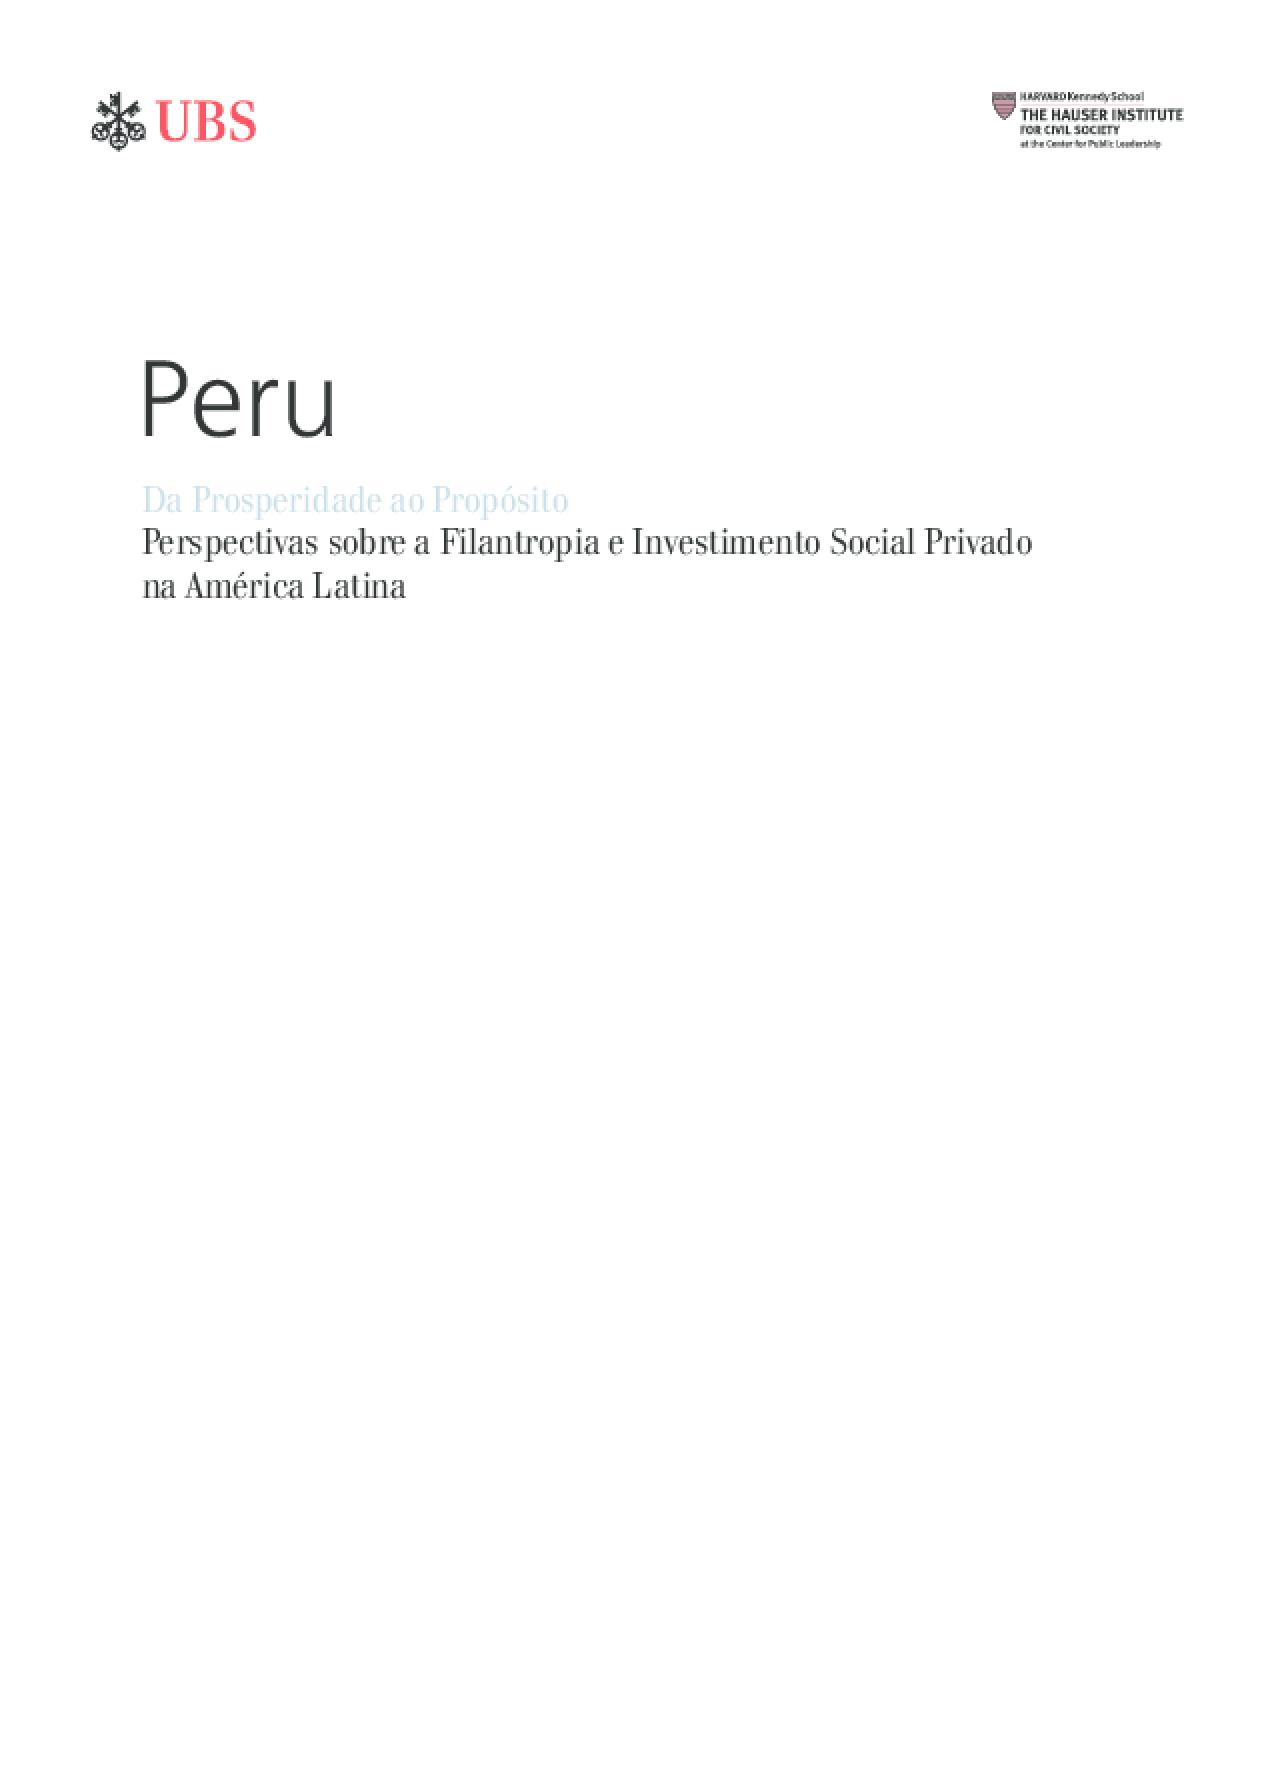 Da Prosperidade ao Propósito: Perspectivas sobre a Filantropia e Investimento Social Privado na América Latina - Peru